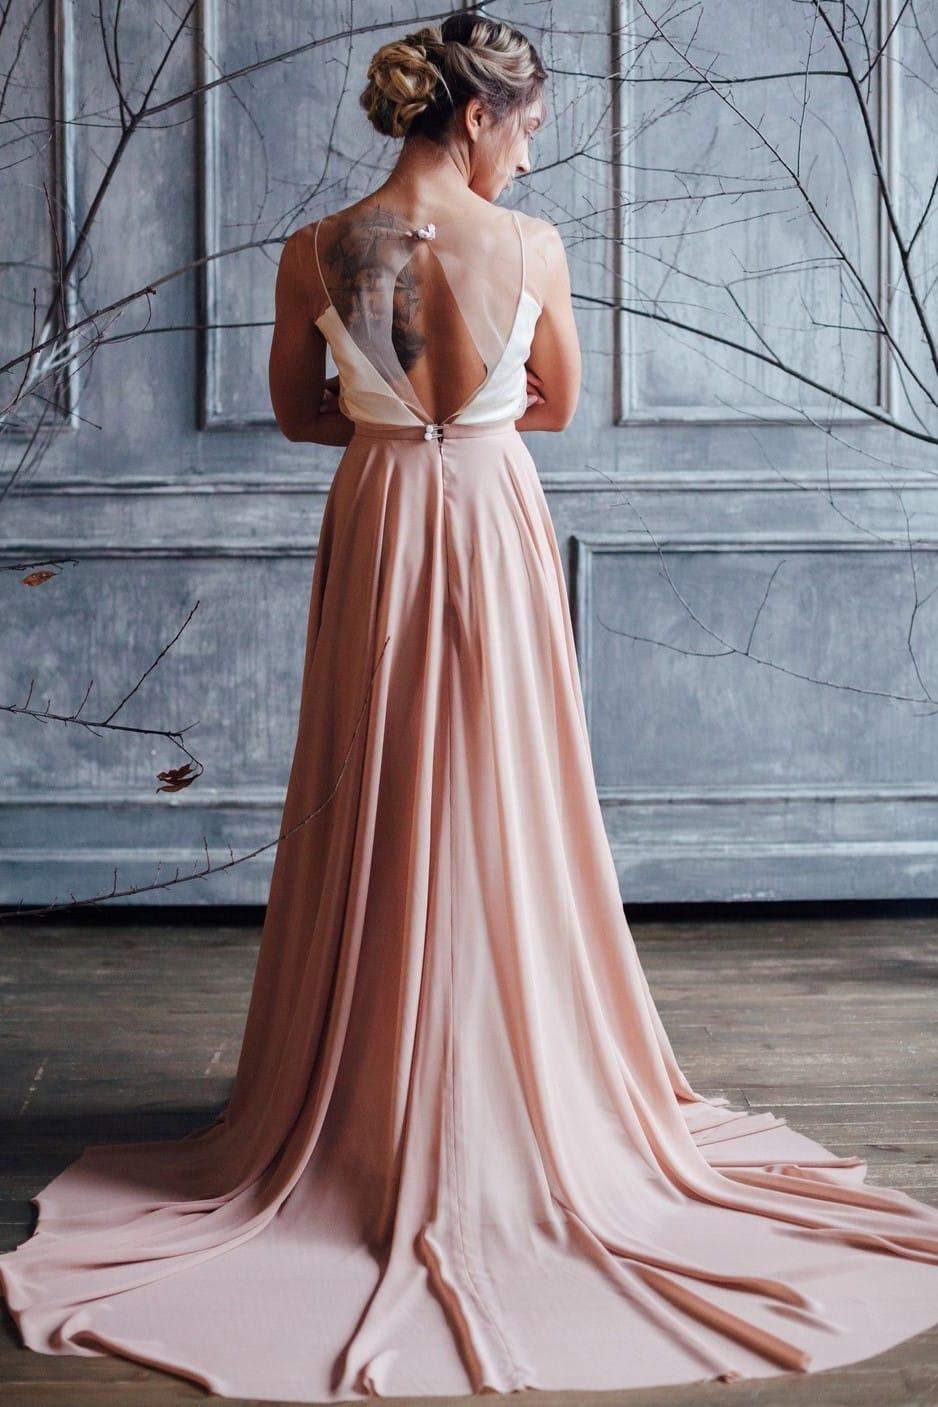 Вечернее платье GRANDY, коллекция FLOWER MAGIC, бренд RARE BRIDAL, фото 5